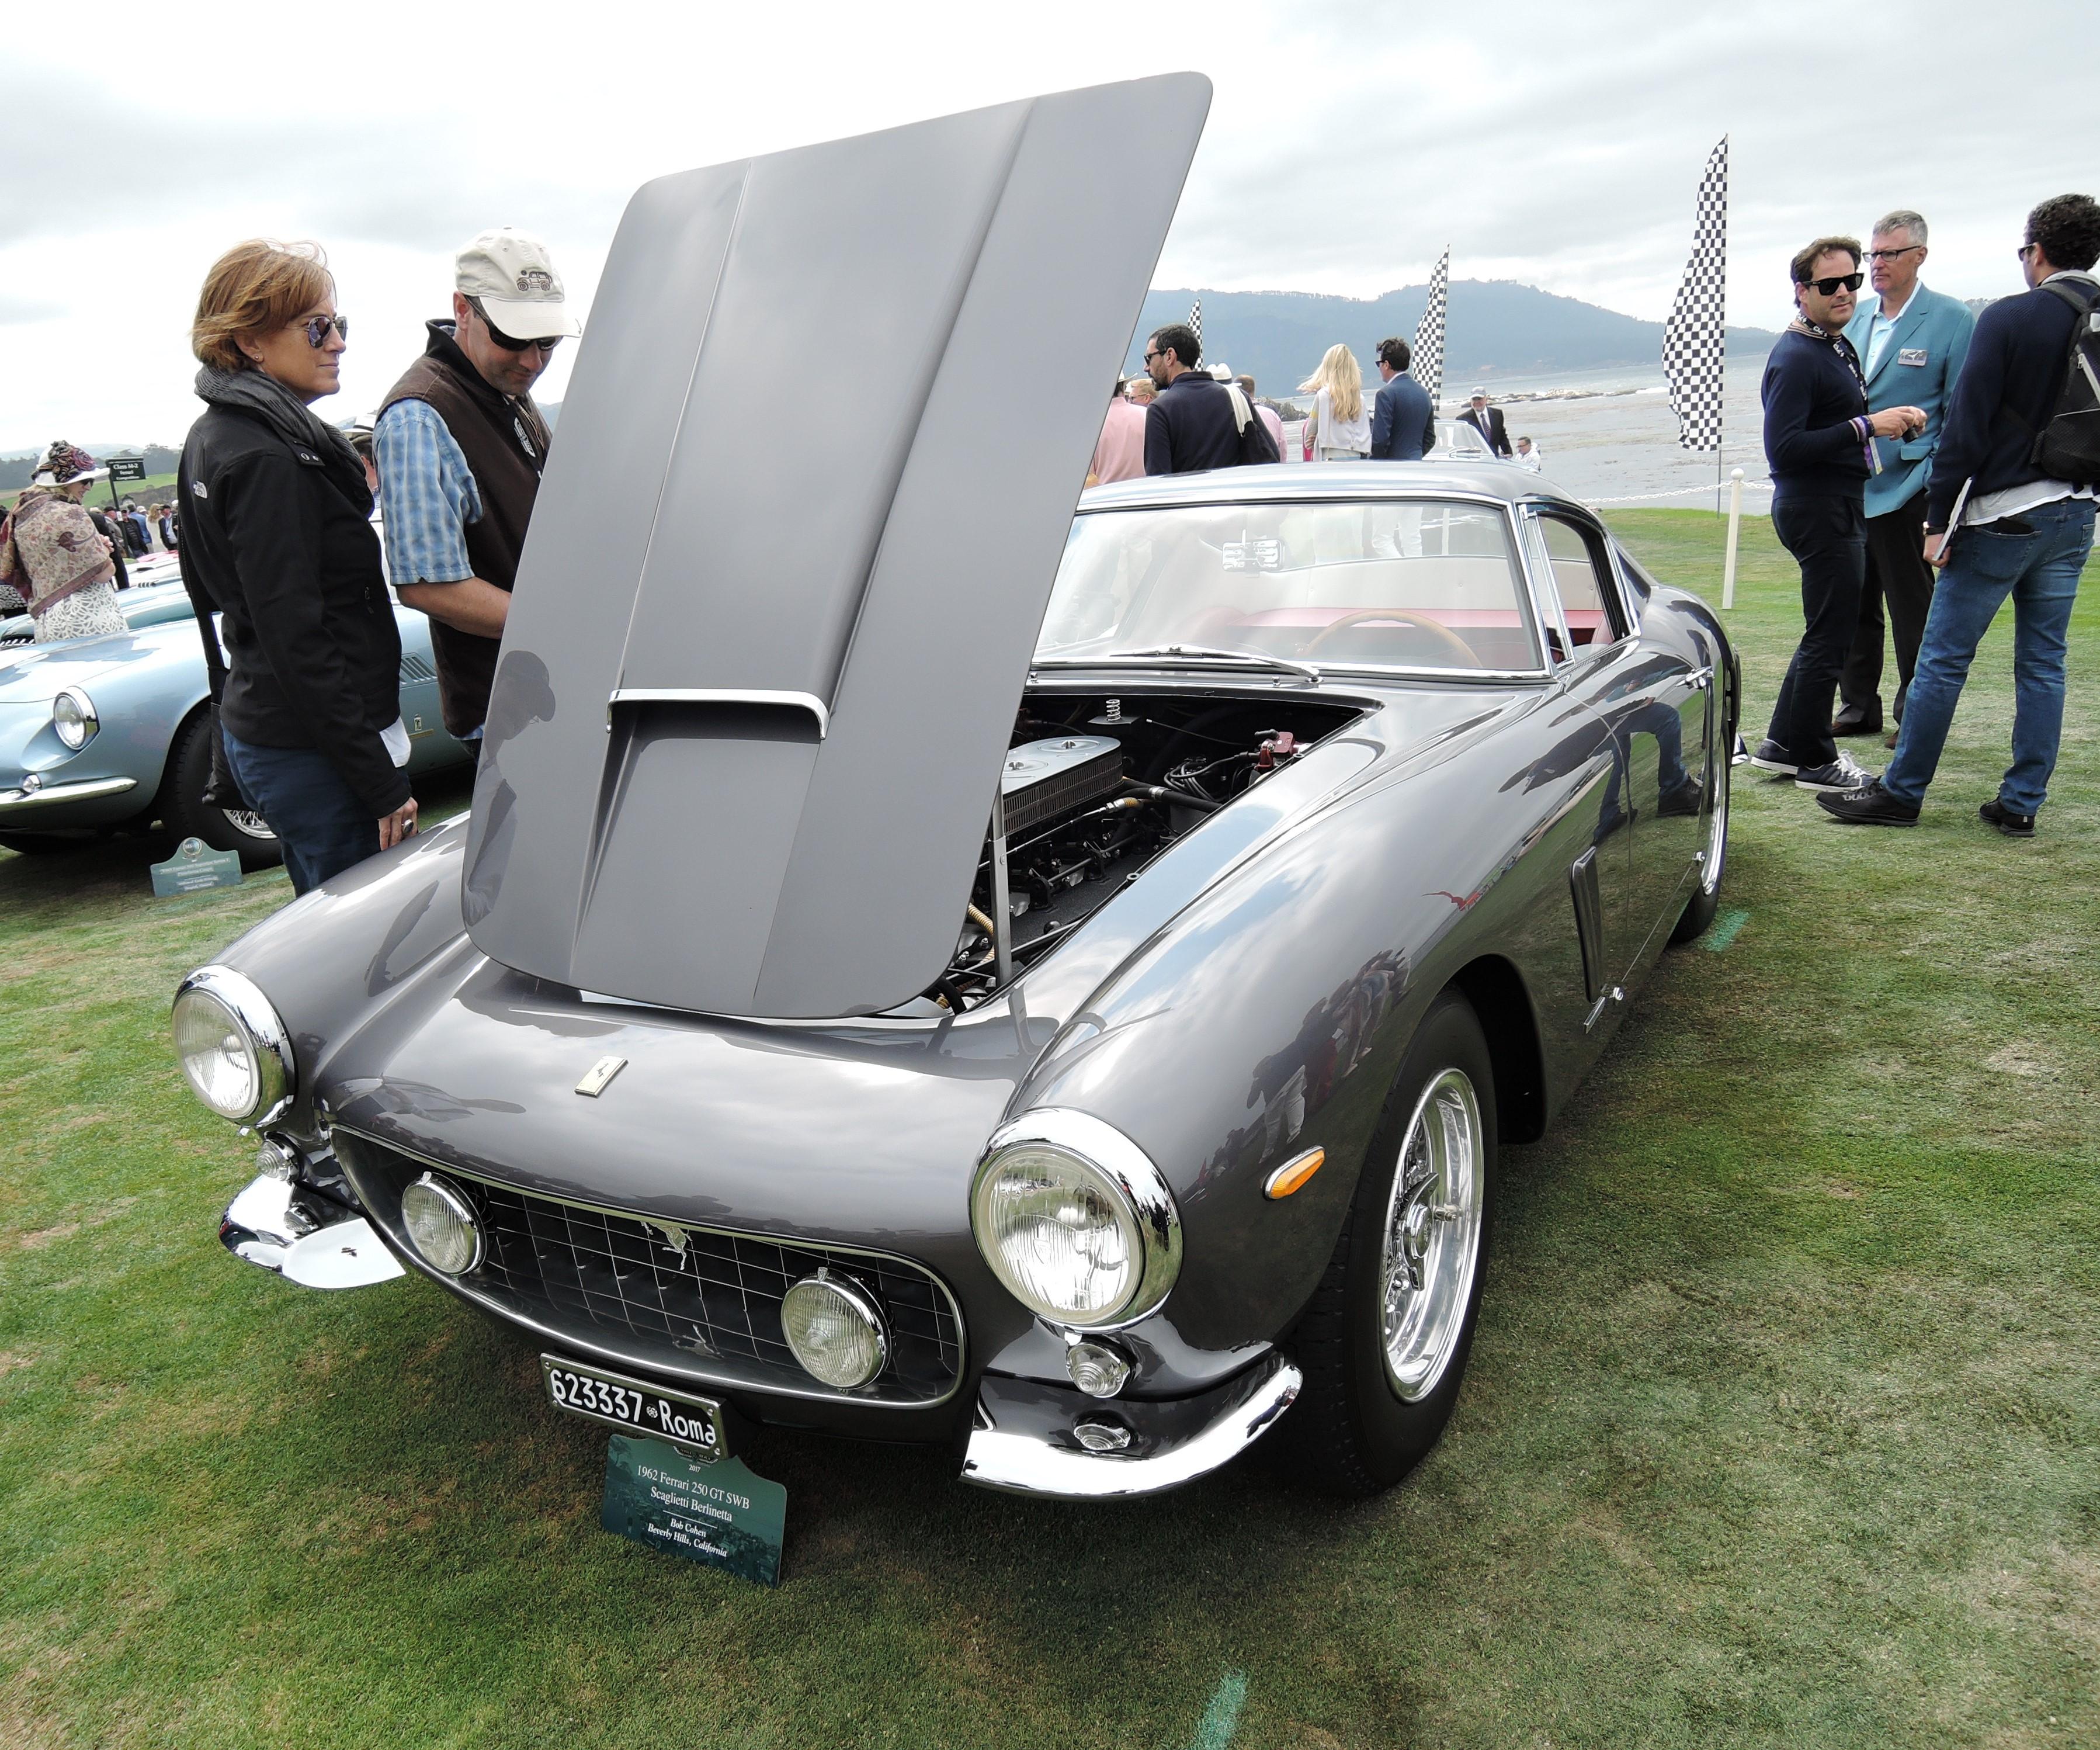 grey 1962 Ferrari 250 GT SWB Scaglietti Berlinetta; Sn 3337 - Pebble Beach Concours d'Elegance 2017